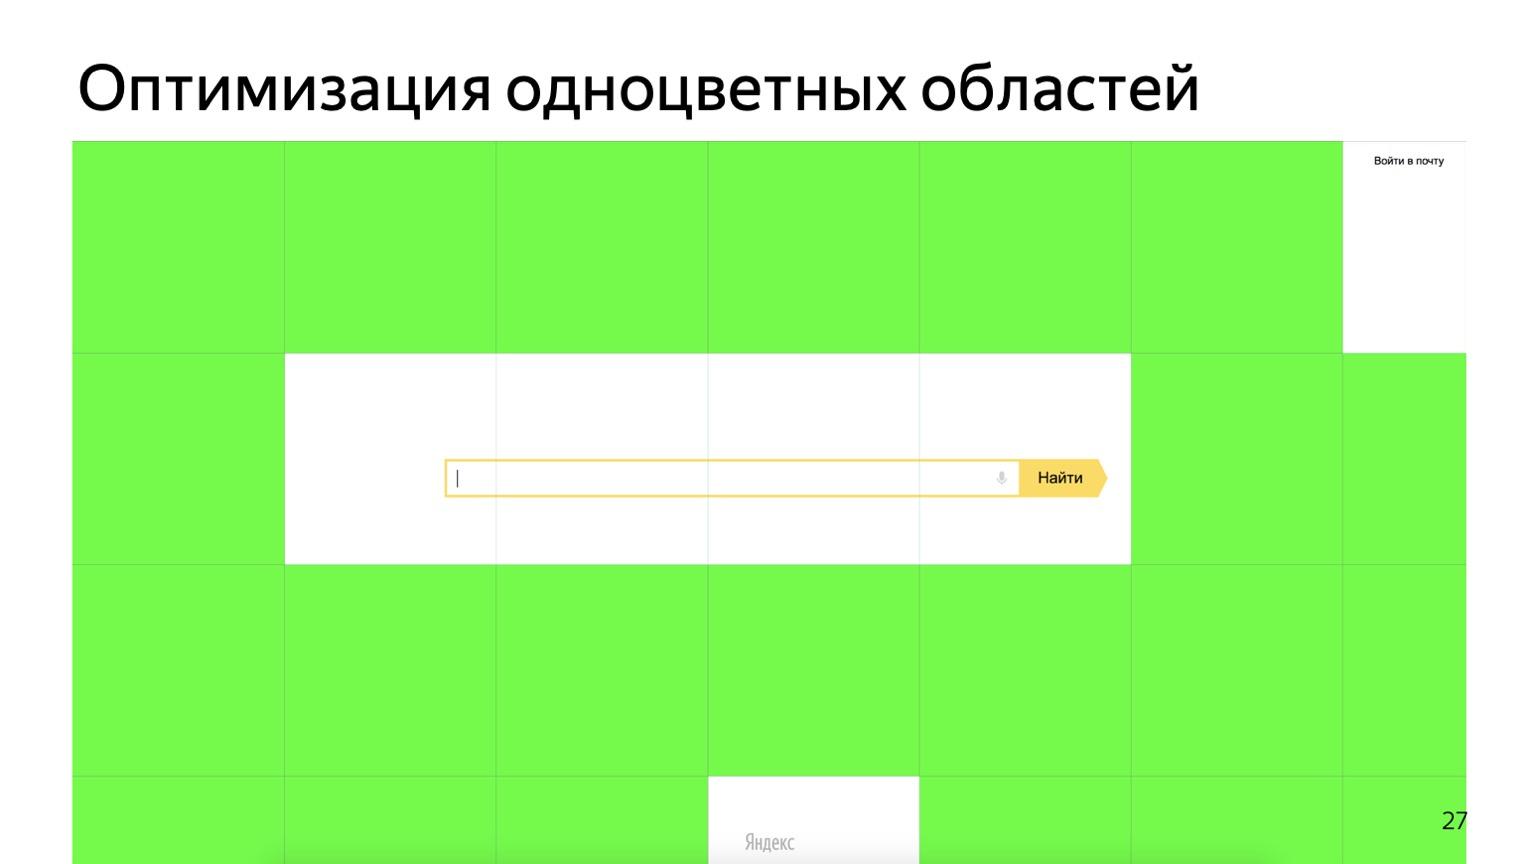 Как рисует браузер. Доклад Яндекса - 26